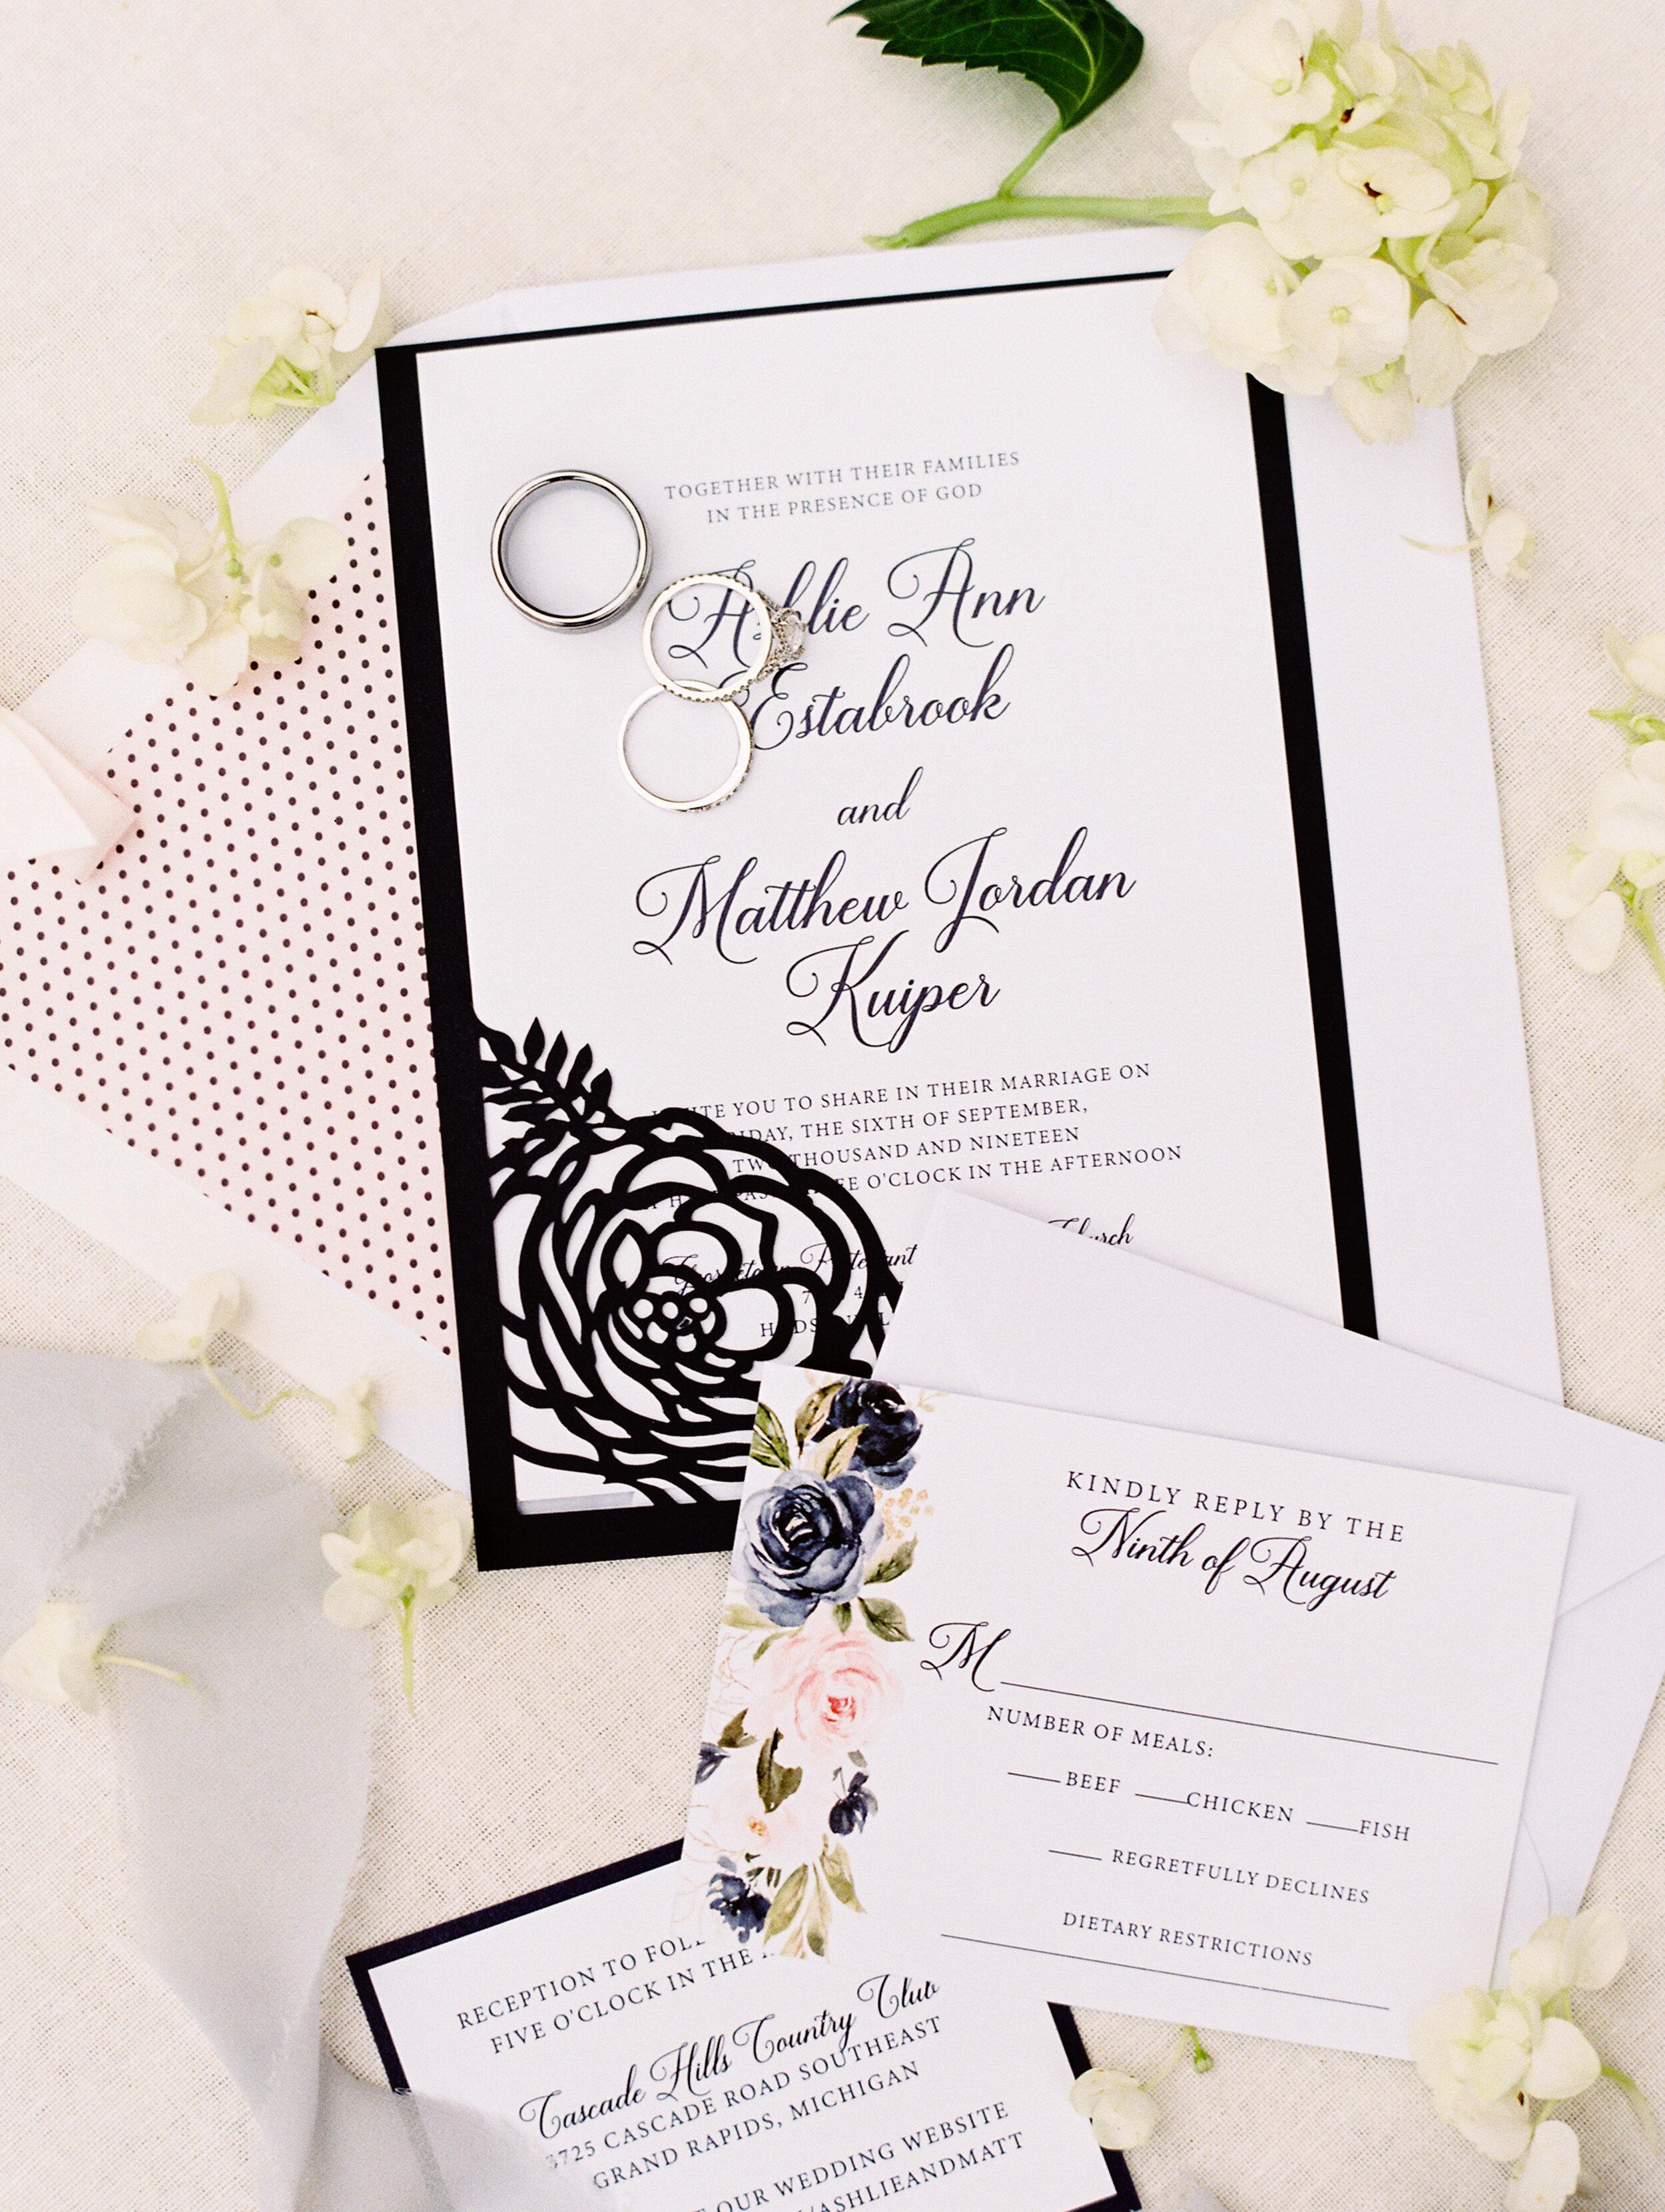 Kuiper+Wedding+Details-23.jpg